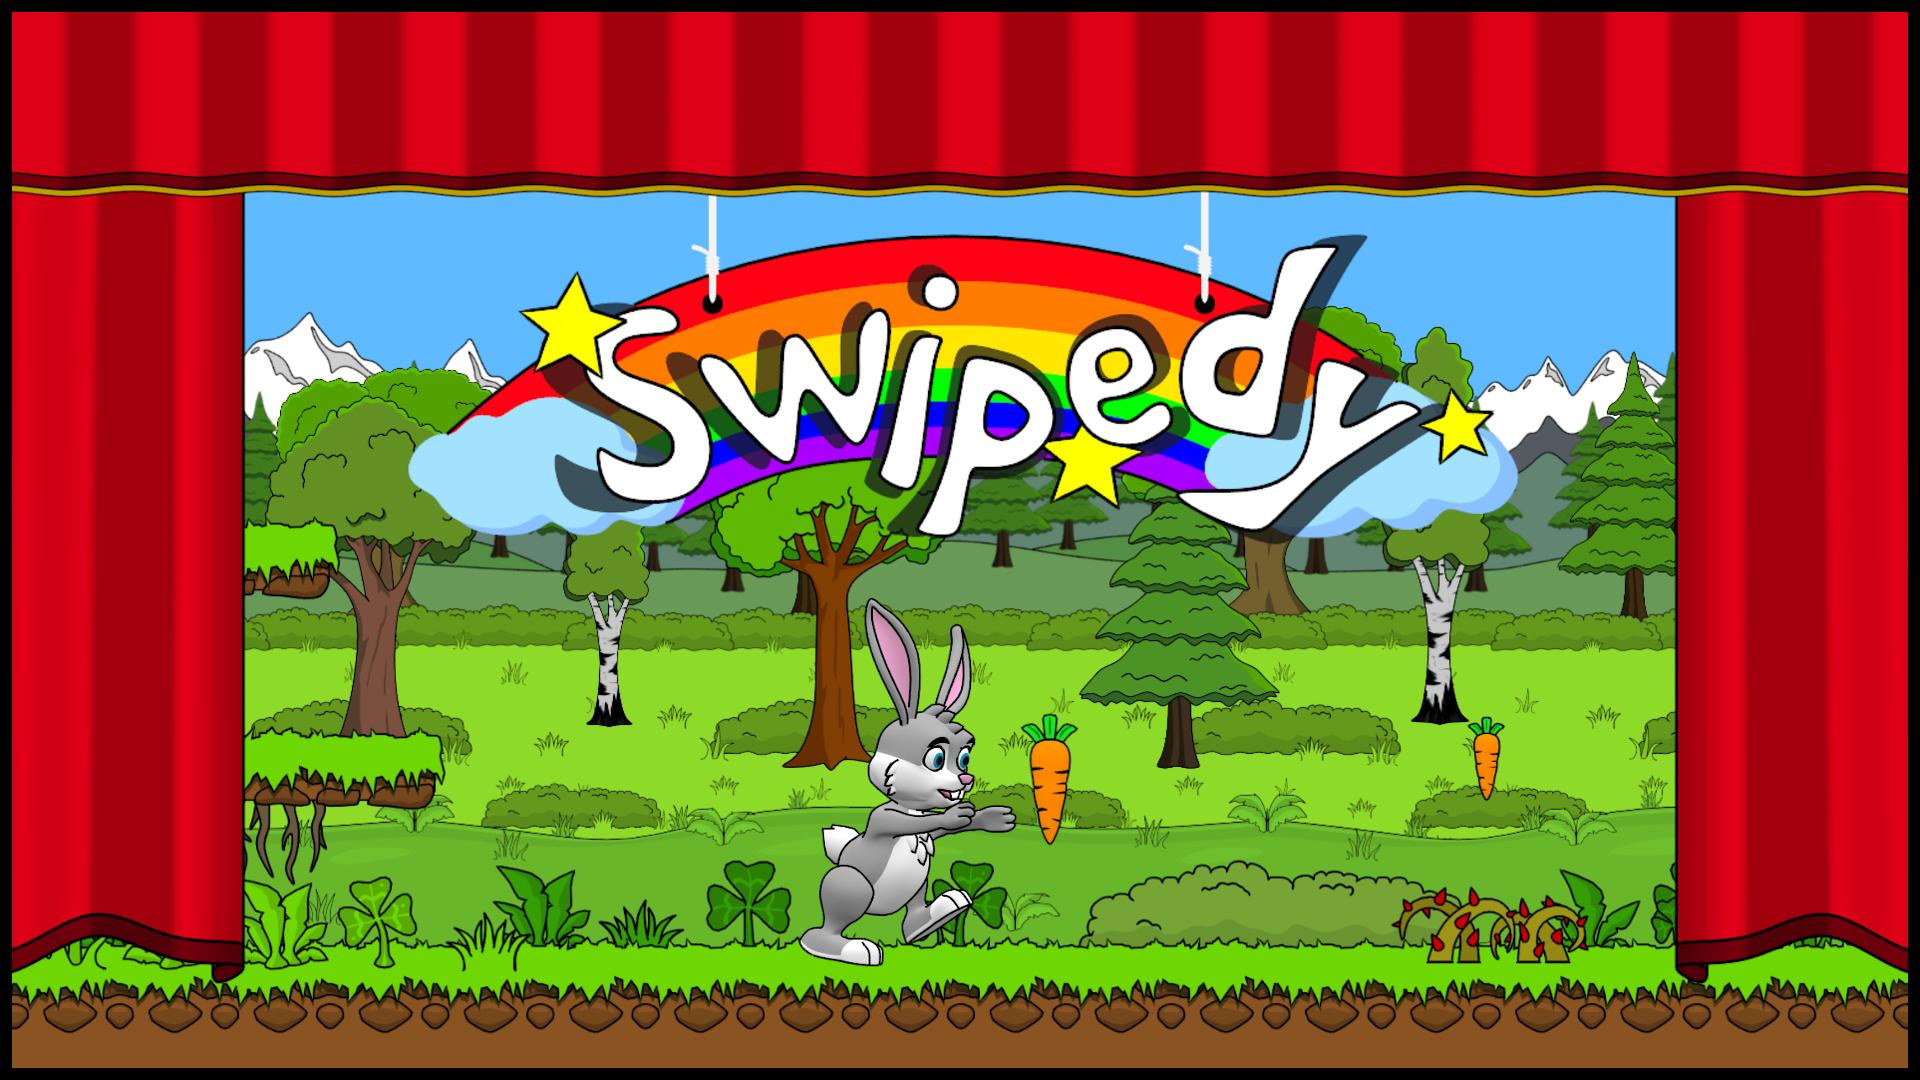 Swipedy